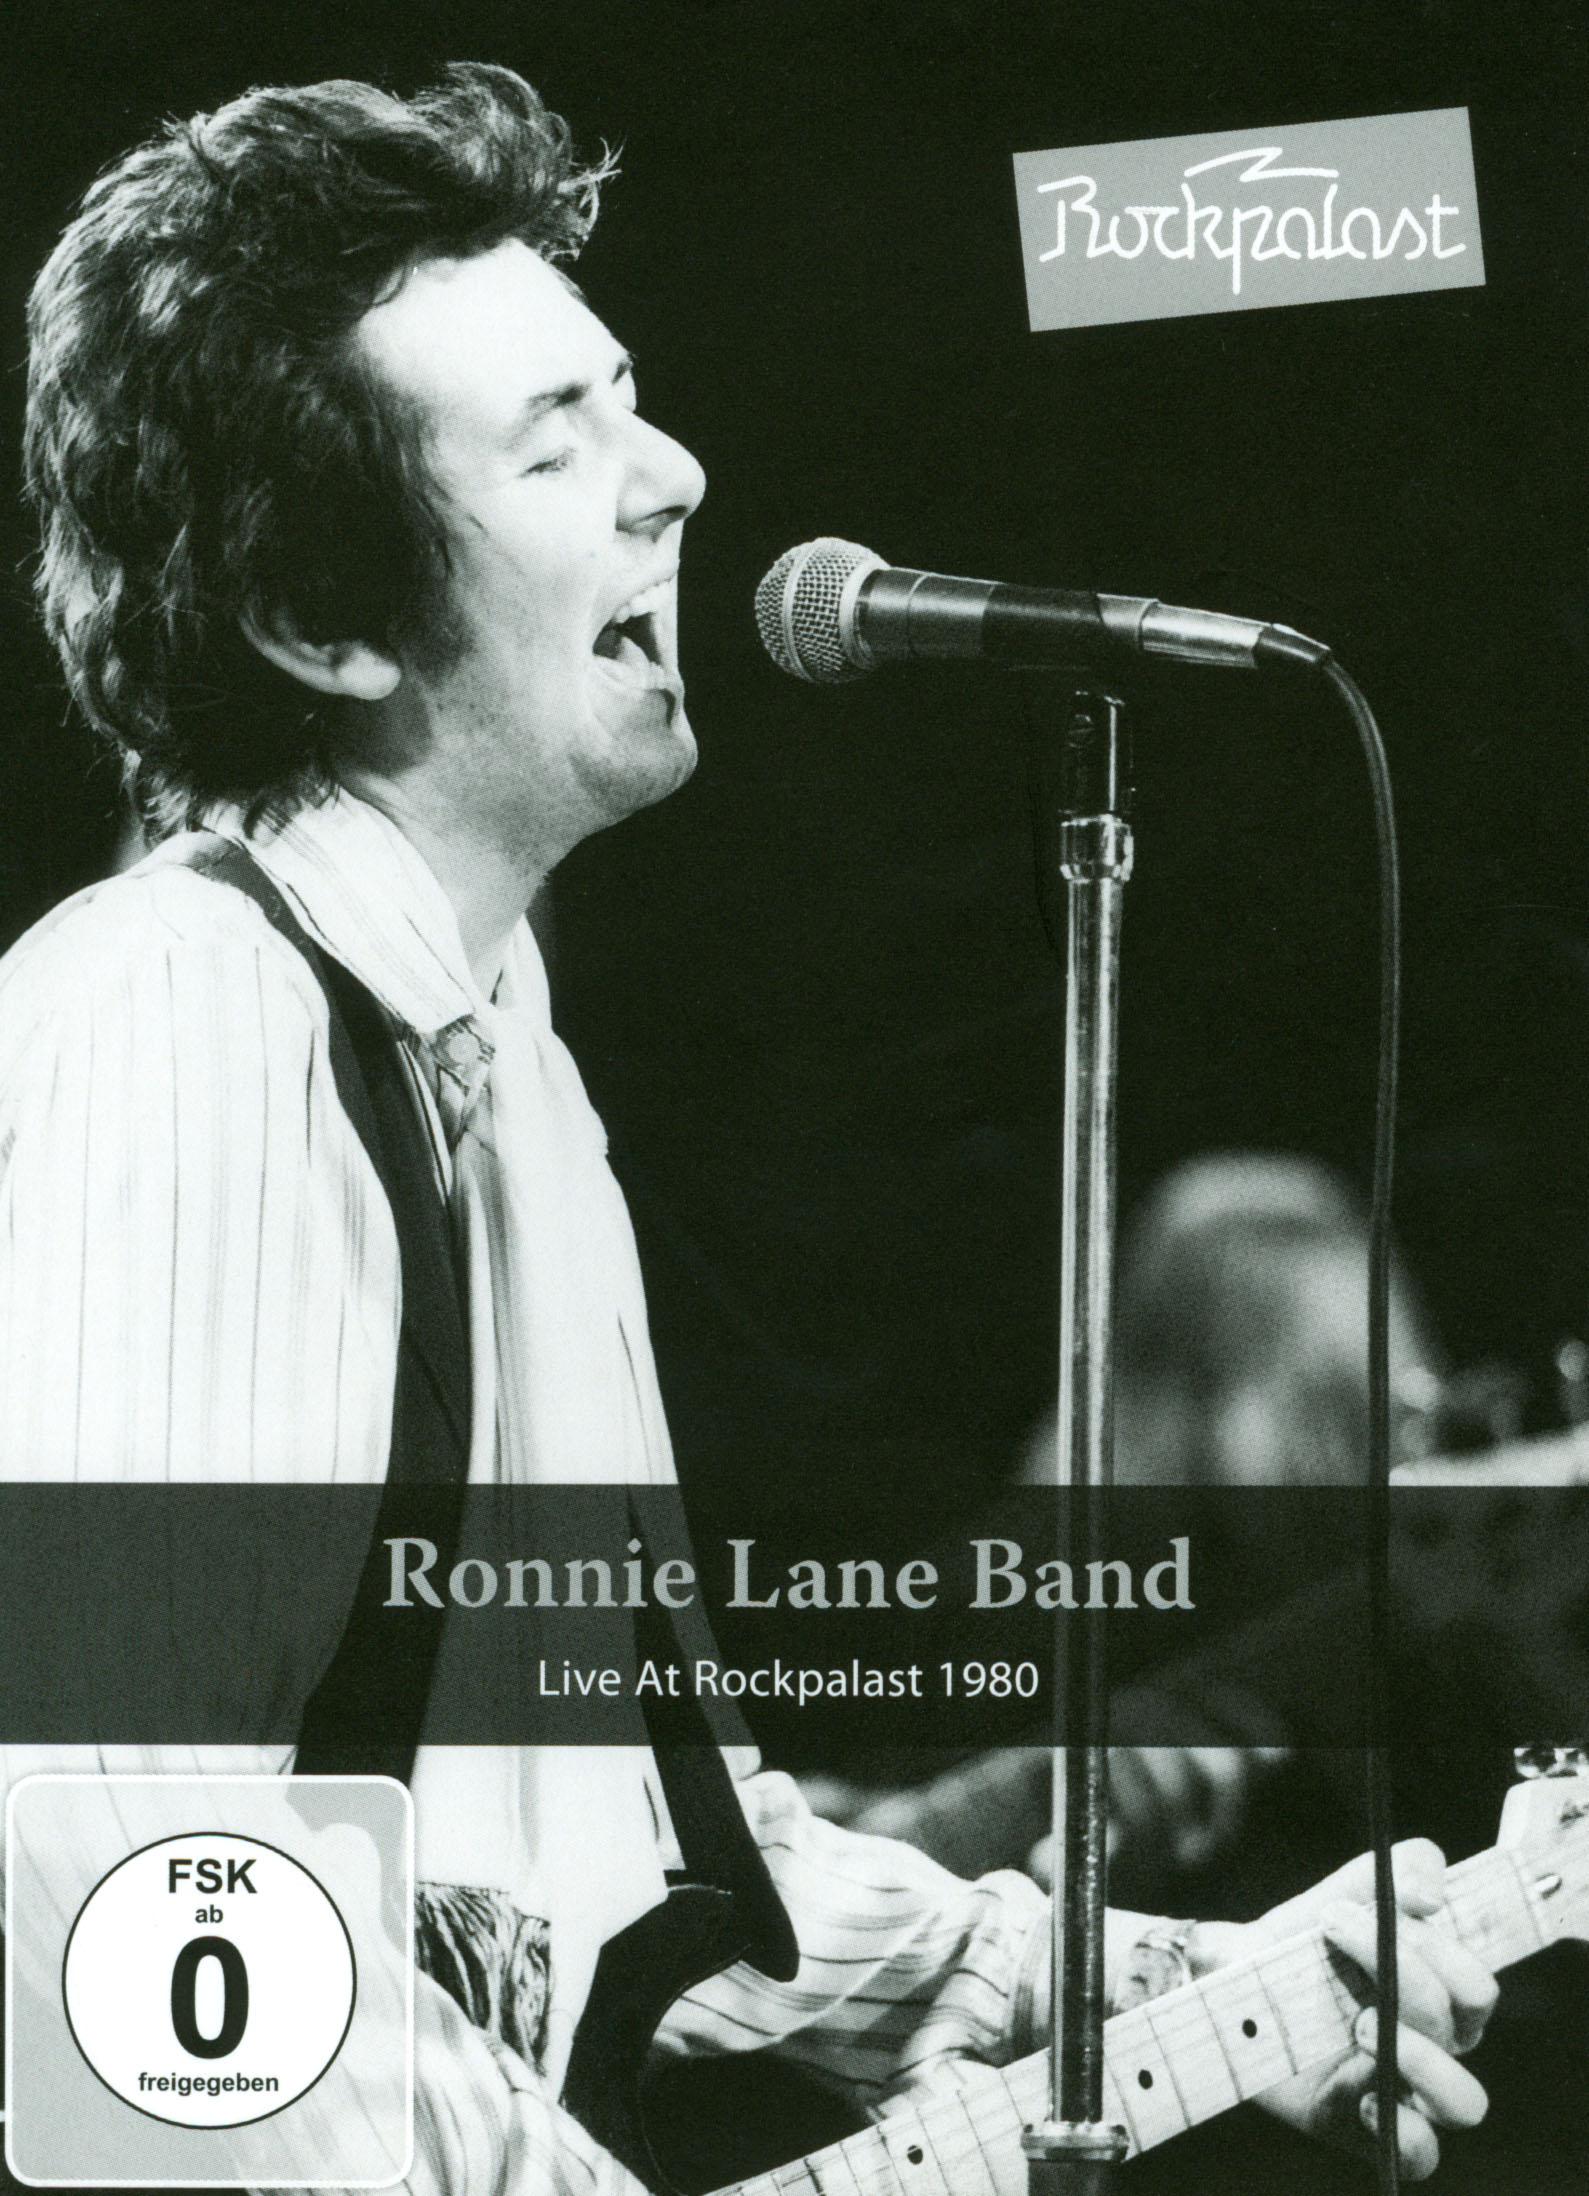 Rockpalast: Ronnie Lane Band